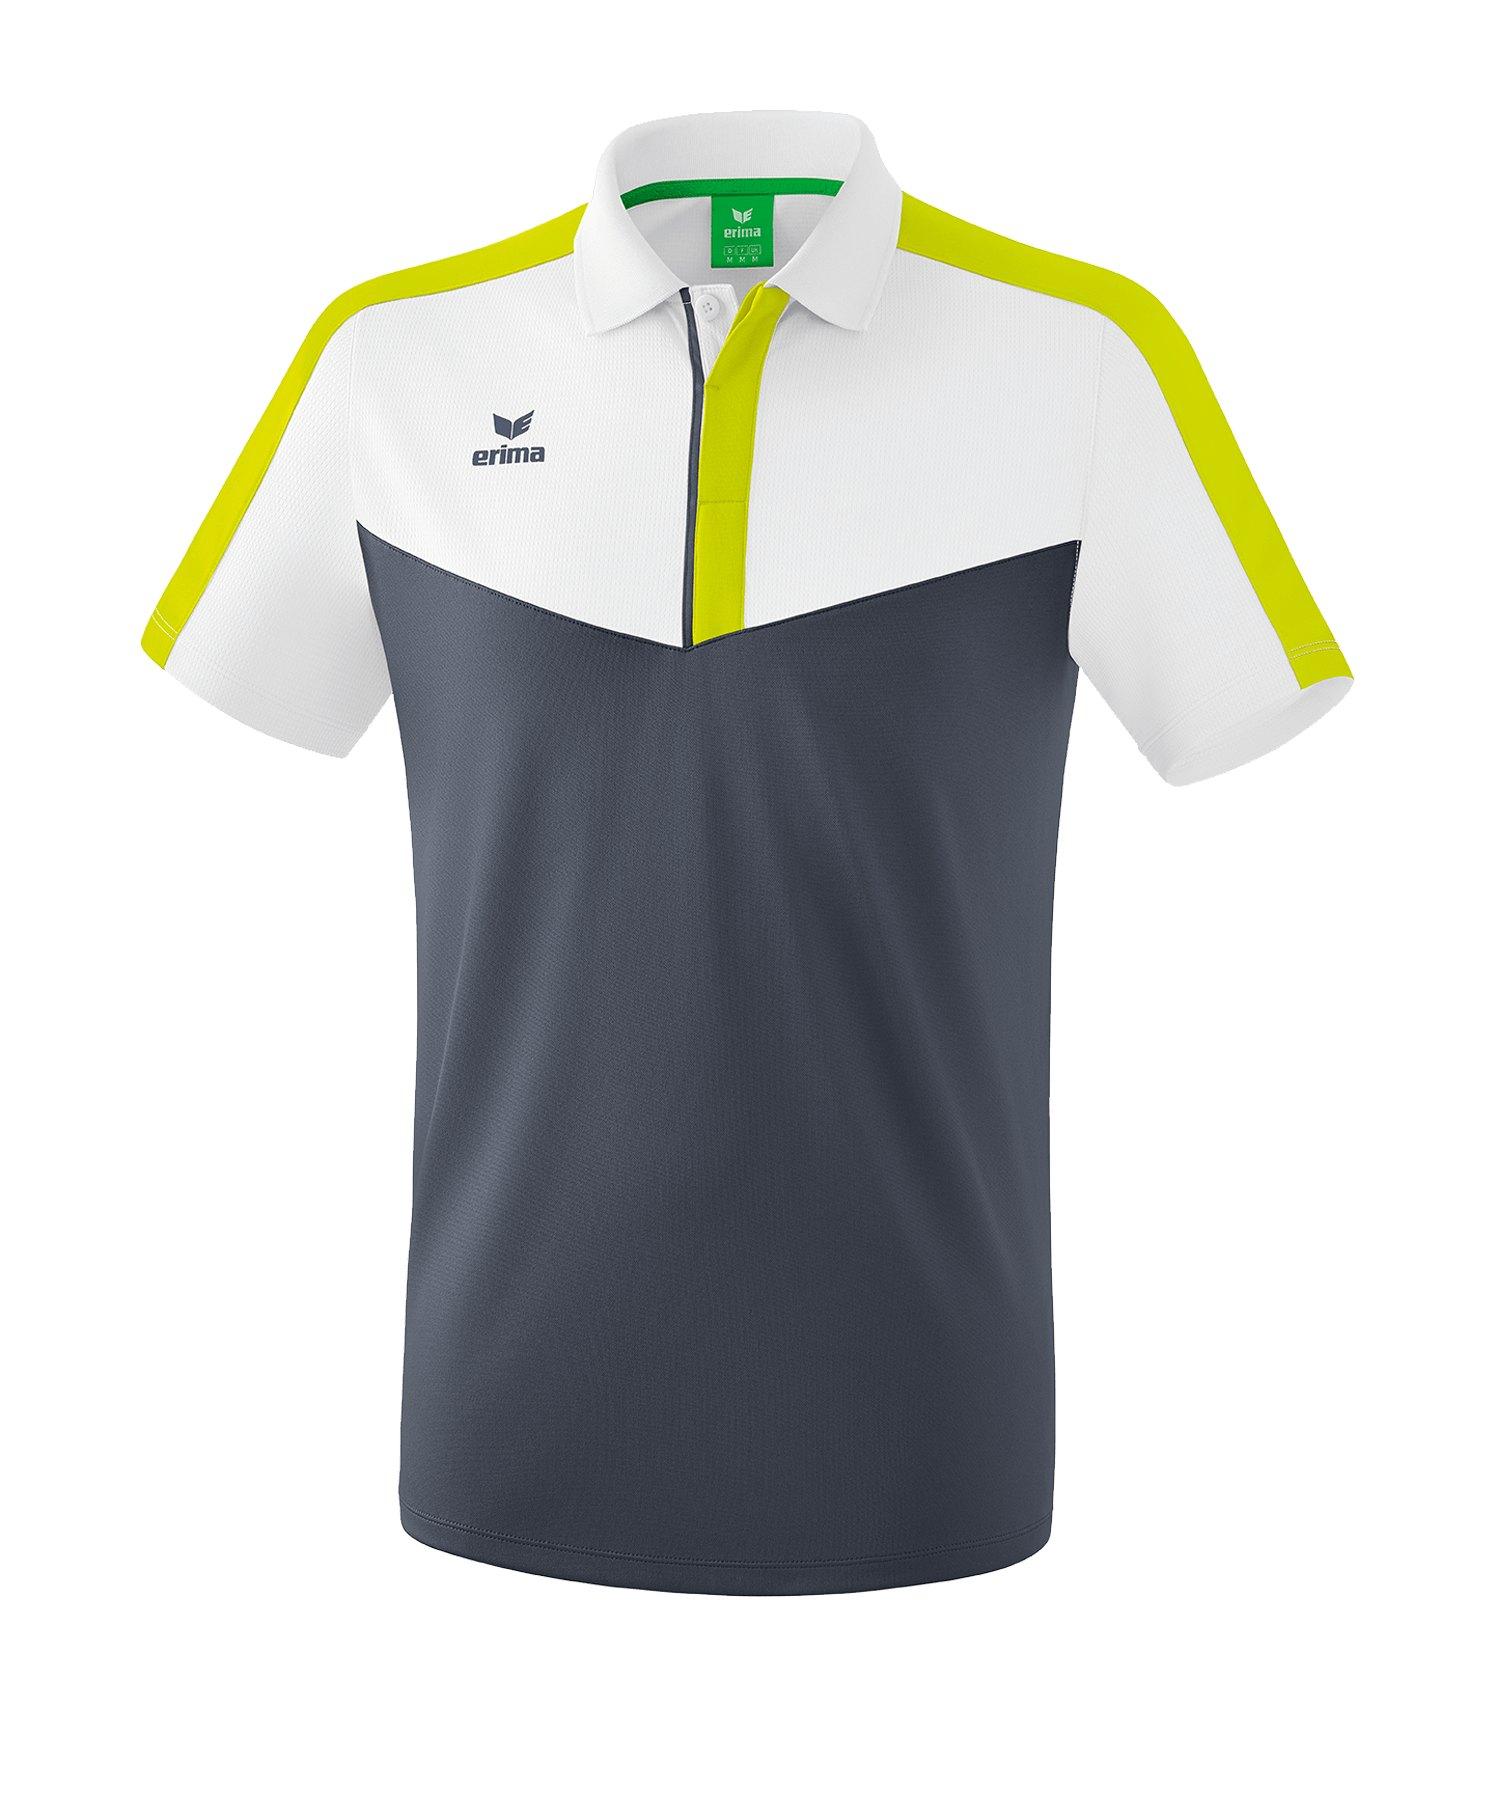 Erima Squad Poloshirt Weiss Grau - weiss